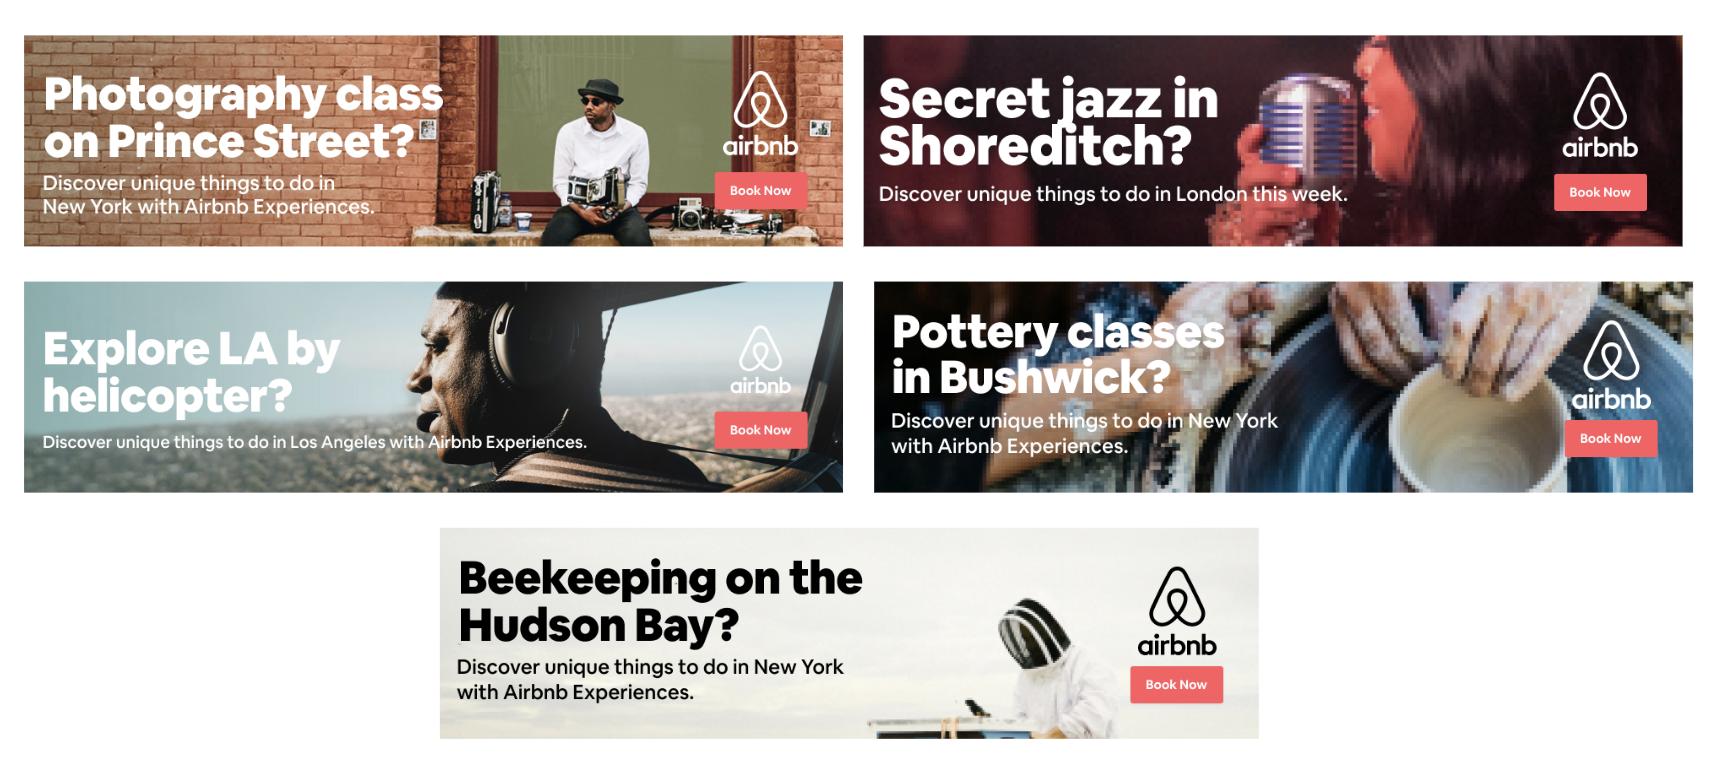 Airbnb Experiences for Locals - Daniel Starosta | Writer